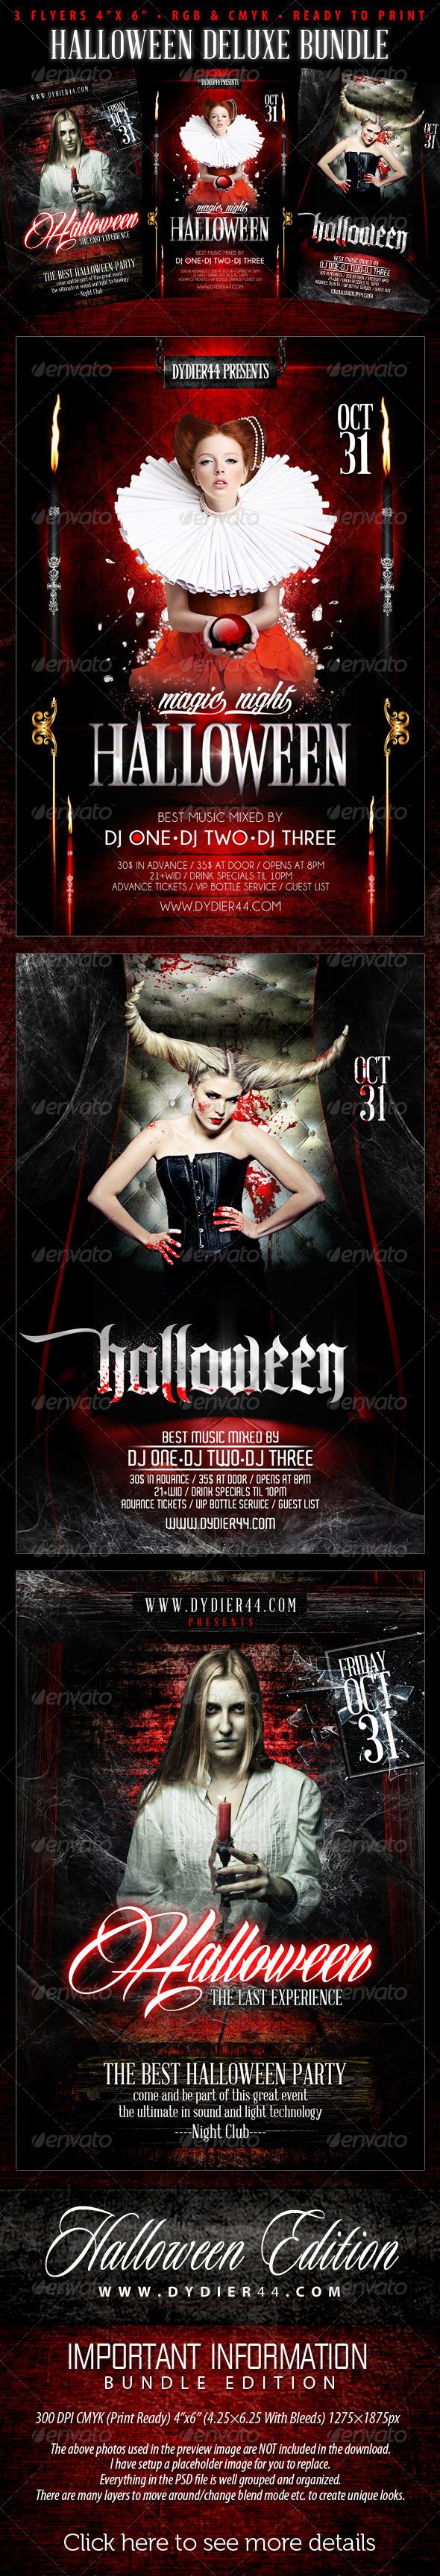 GraphicRiver Halloween Deluxe Bundle 4x6 Flyer Template 5715670